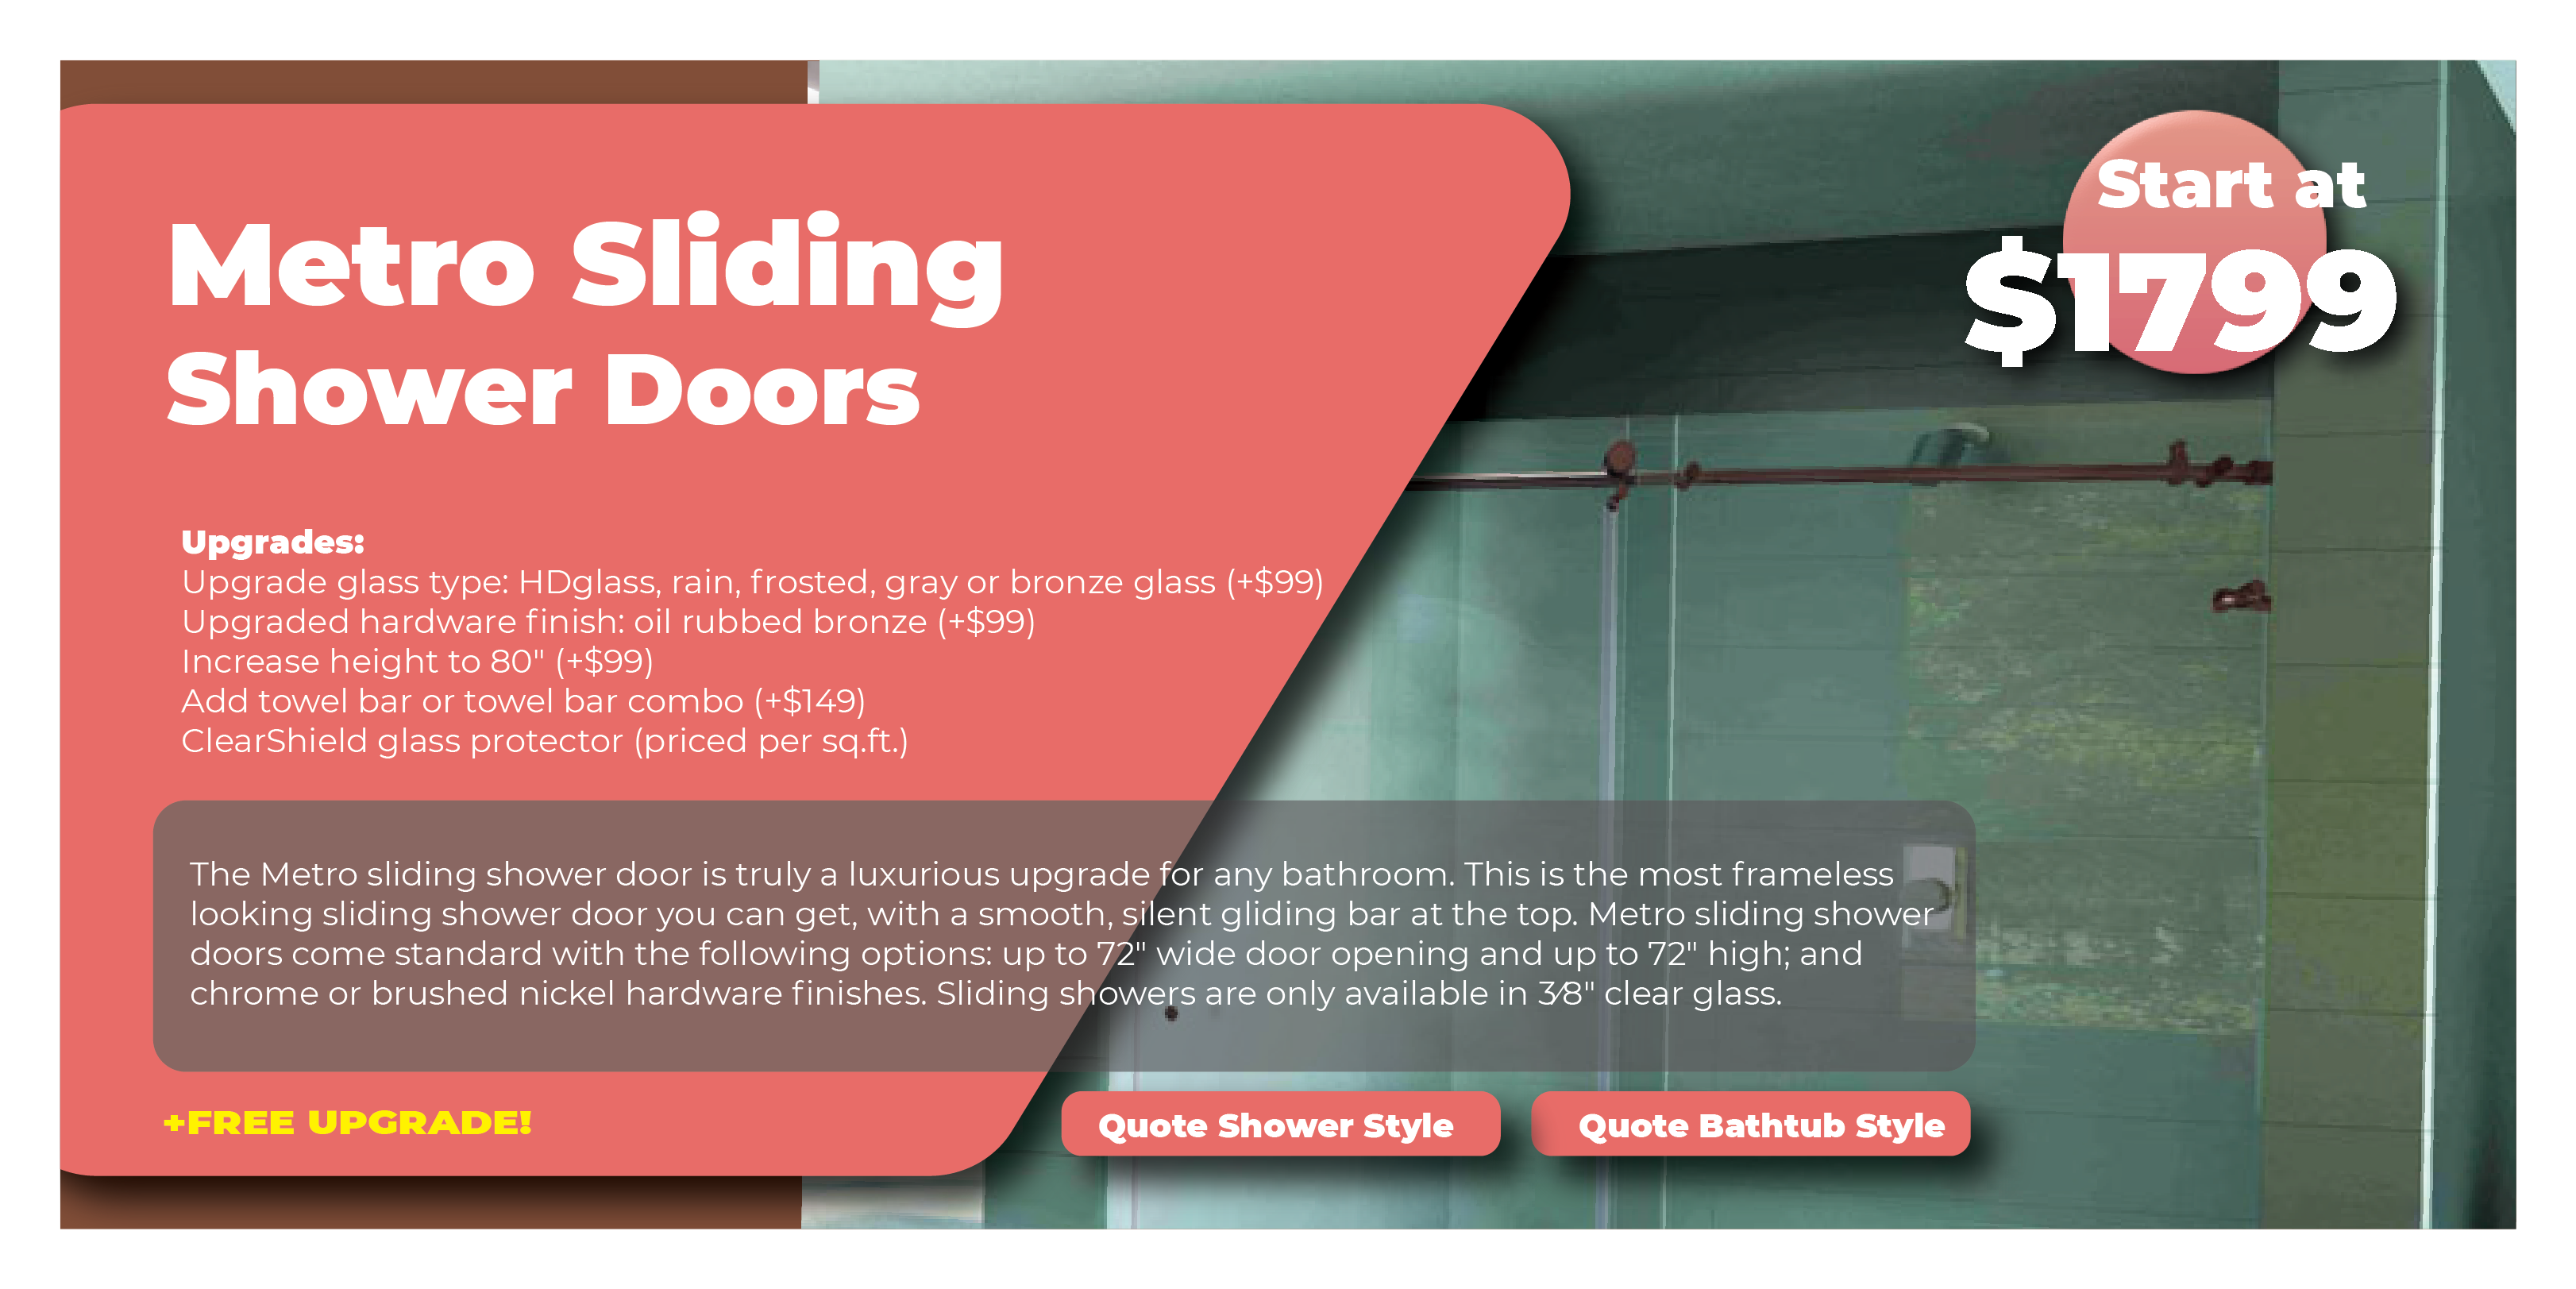 Metro Sliding Shower Doors Promo